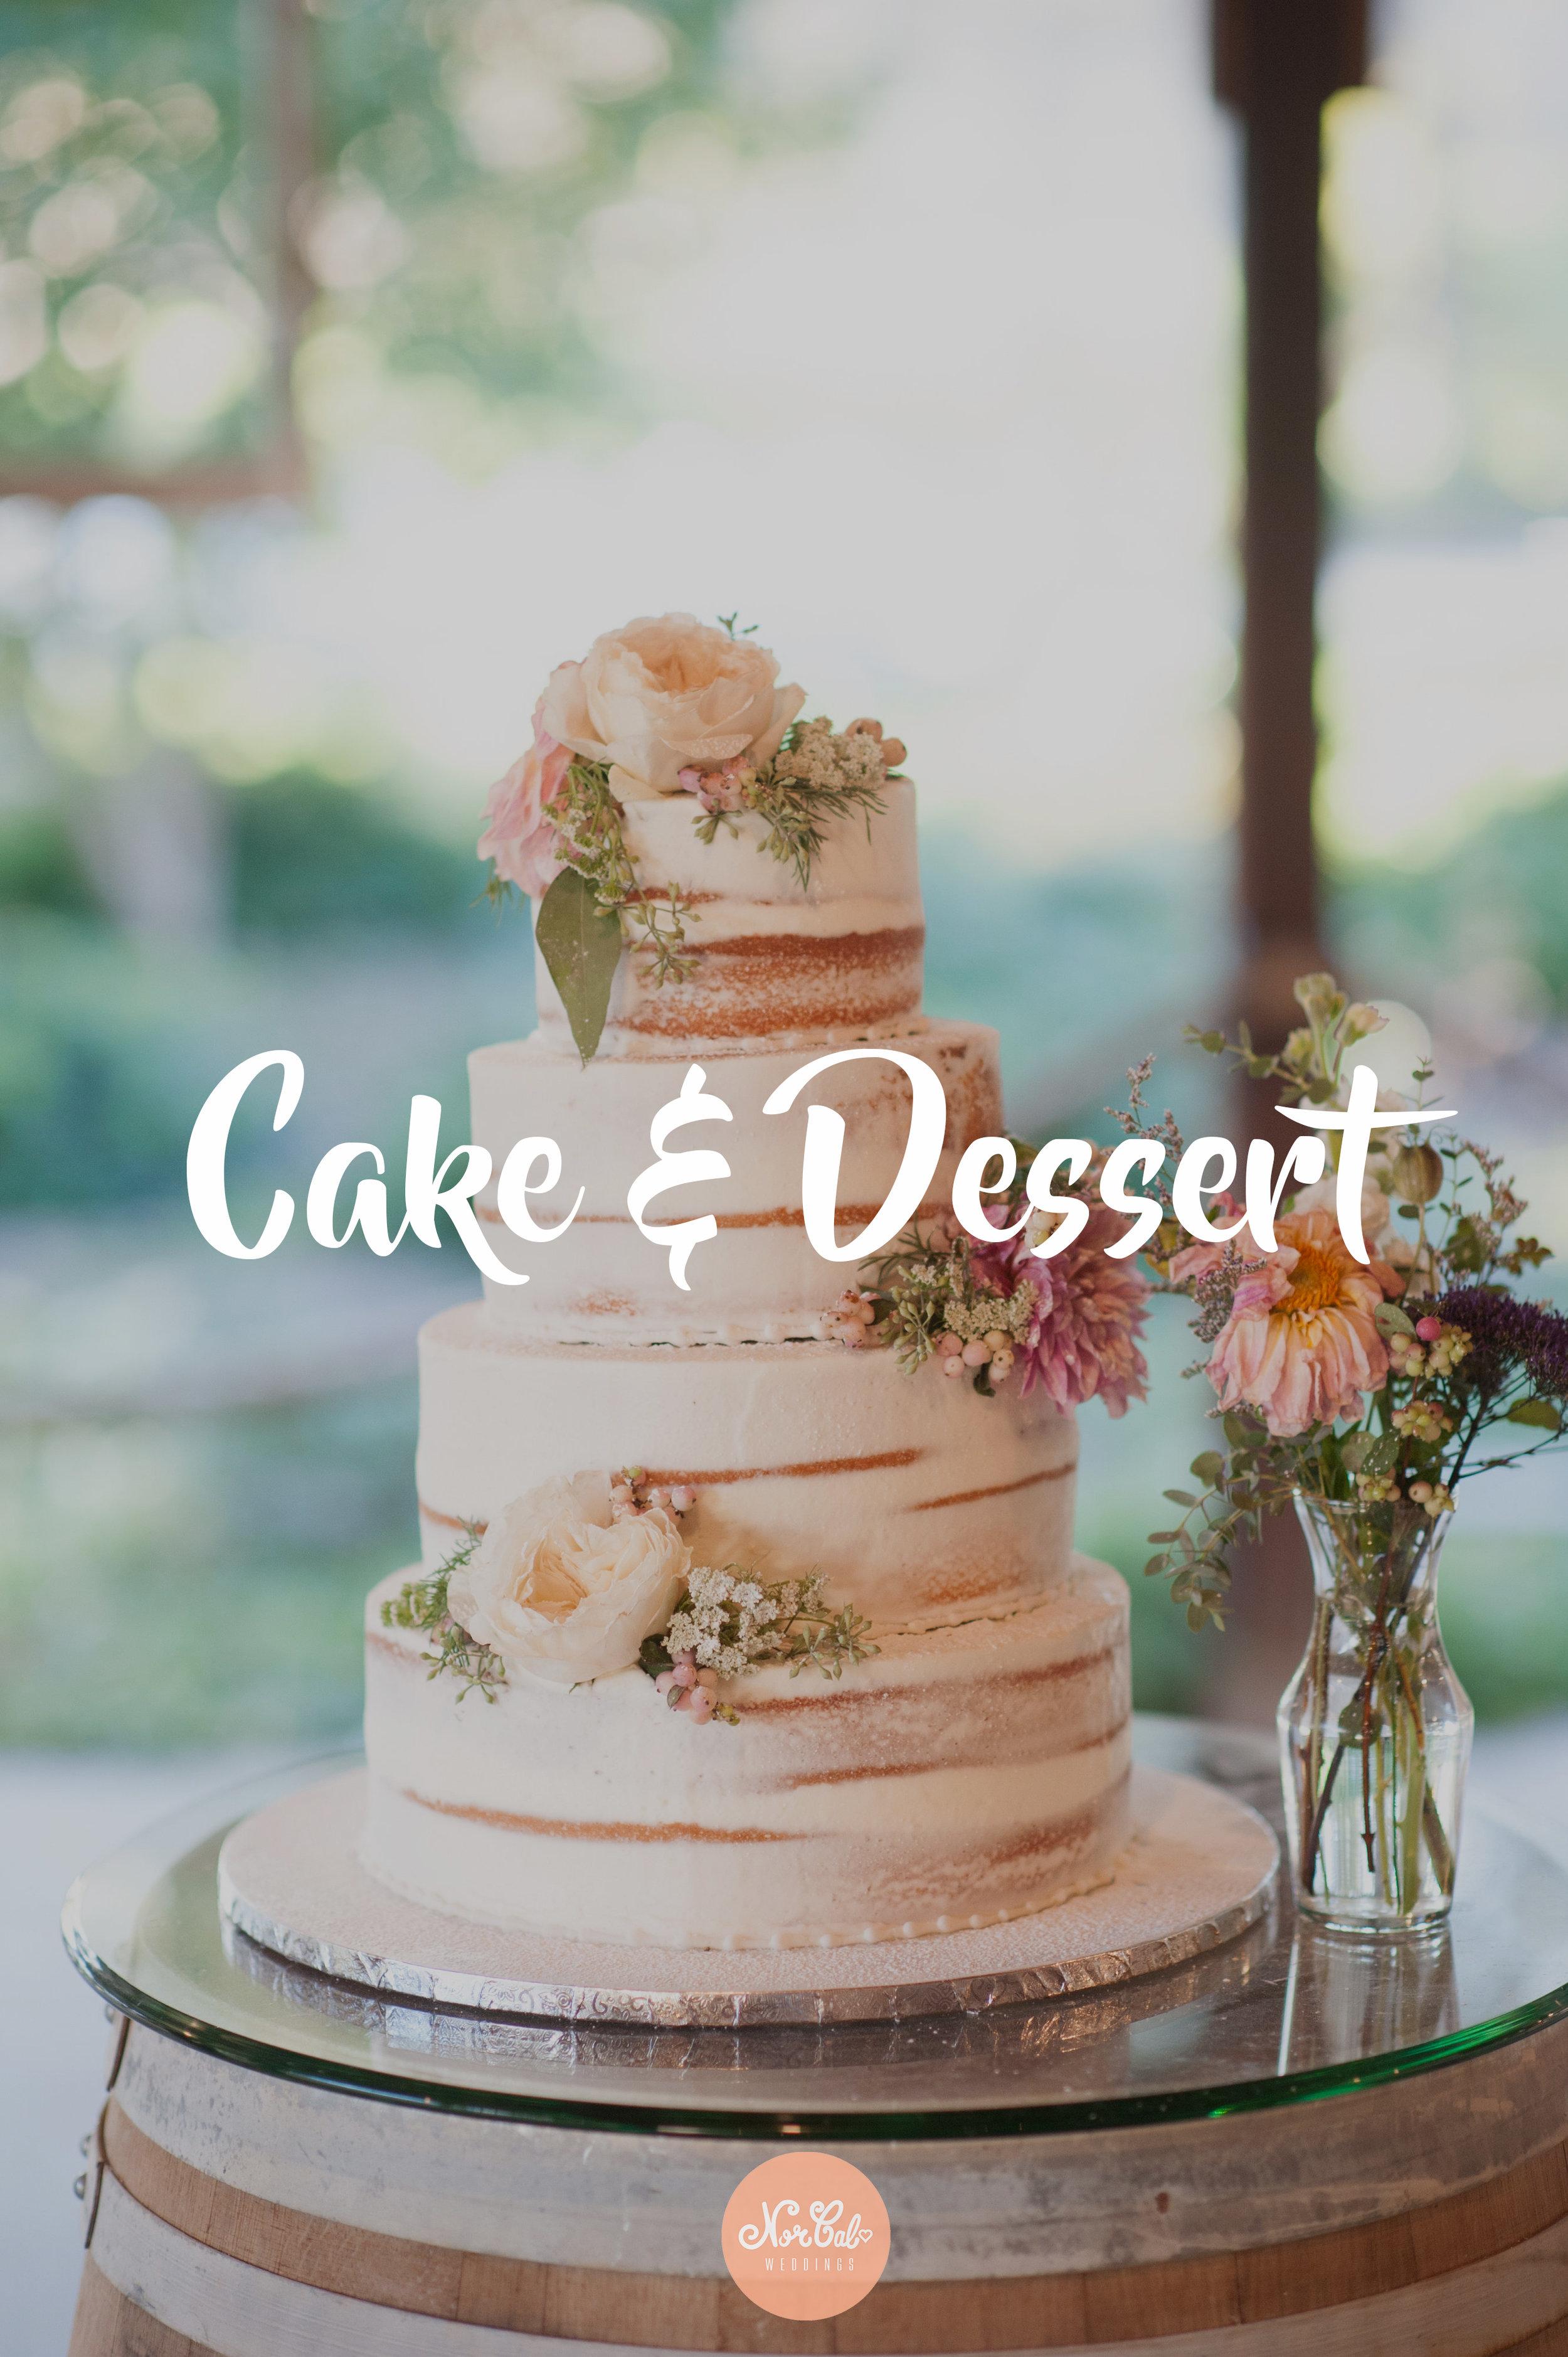 NorCal Weddings Cake and Dessert Services.jpg